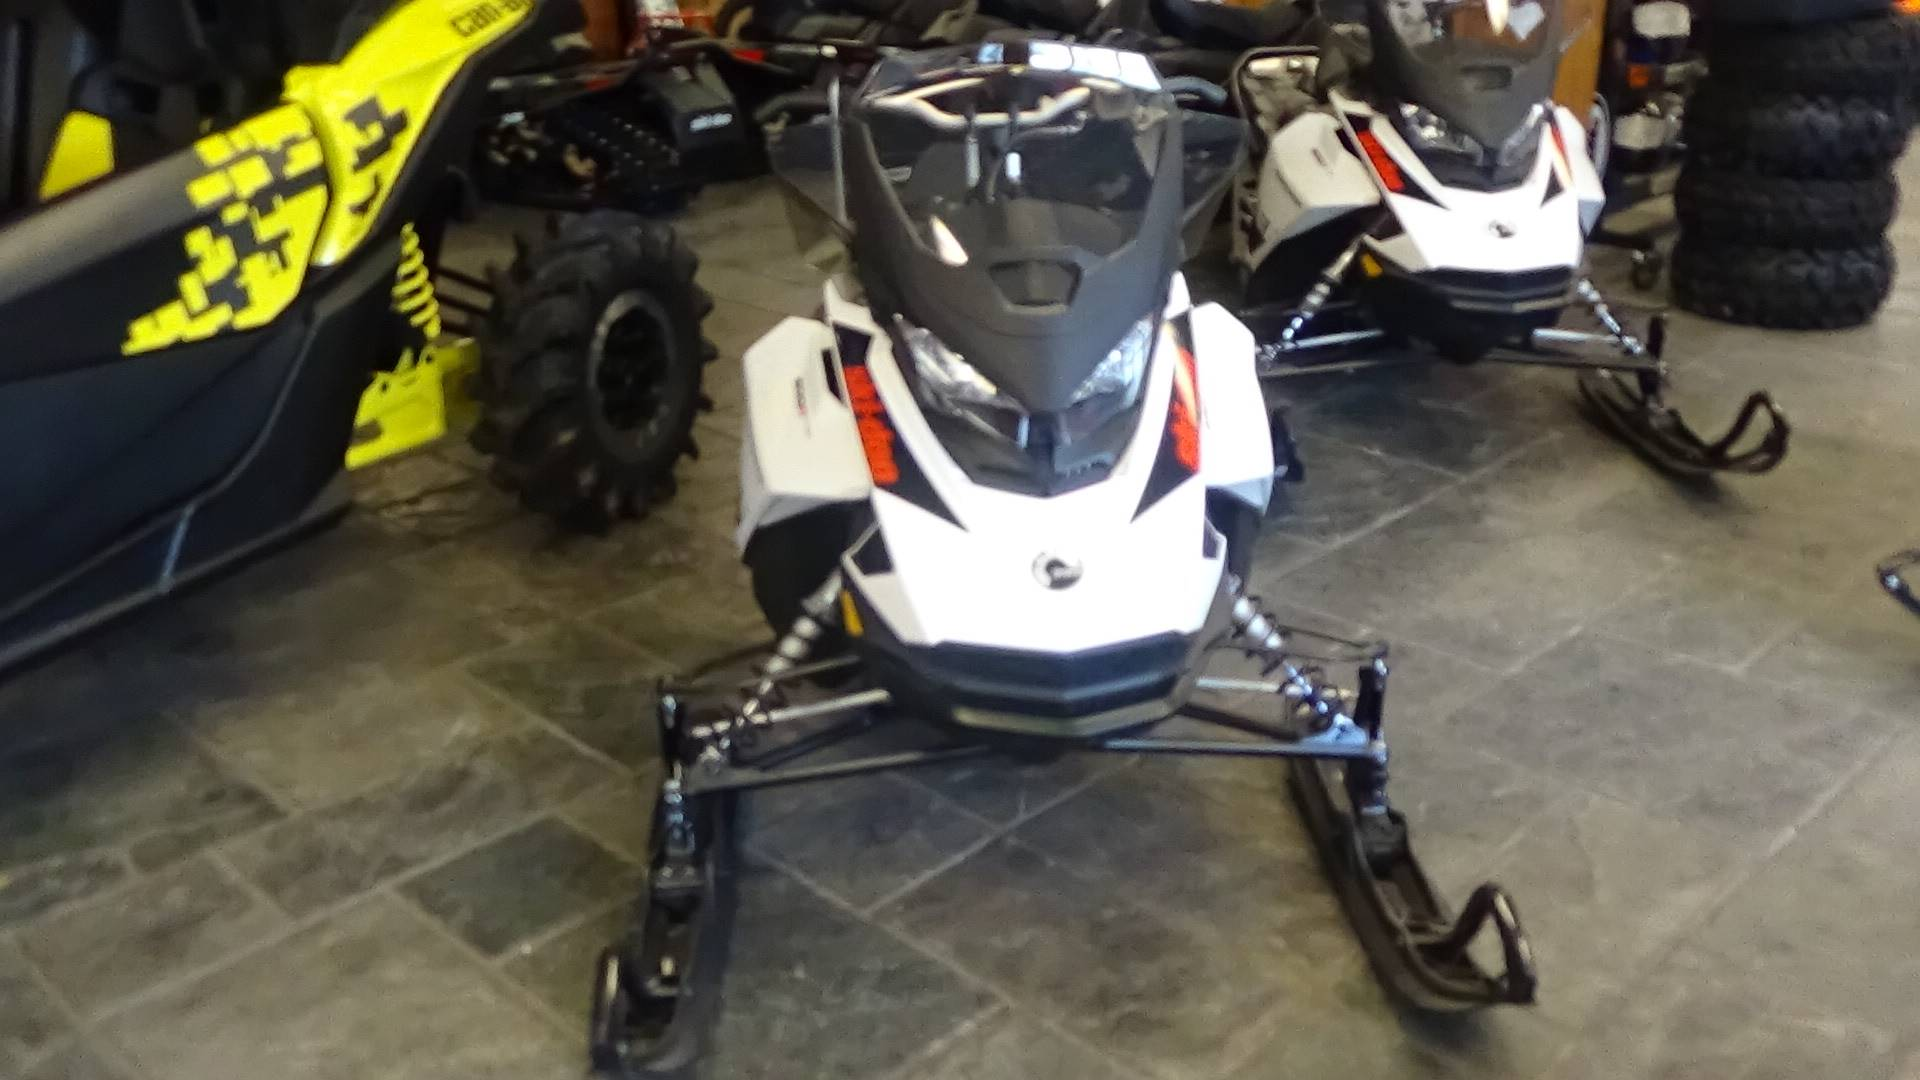 New 2019 Ski-Doo Renegade Adrenaline 600R E-TEC Snowmobiles in Adams